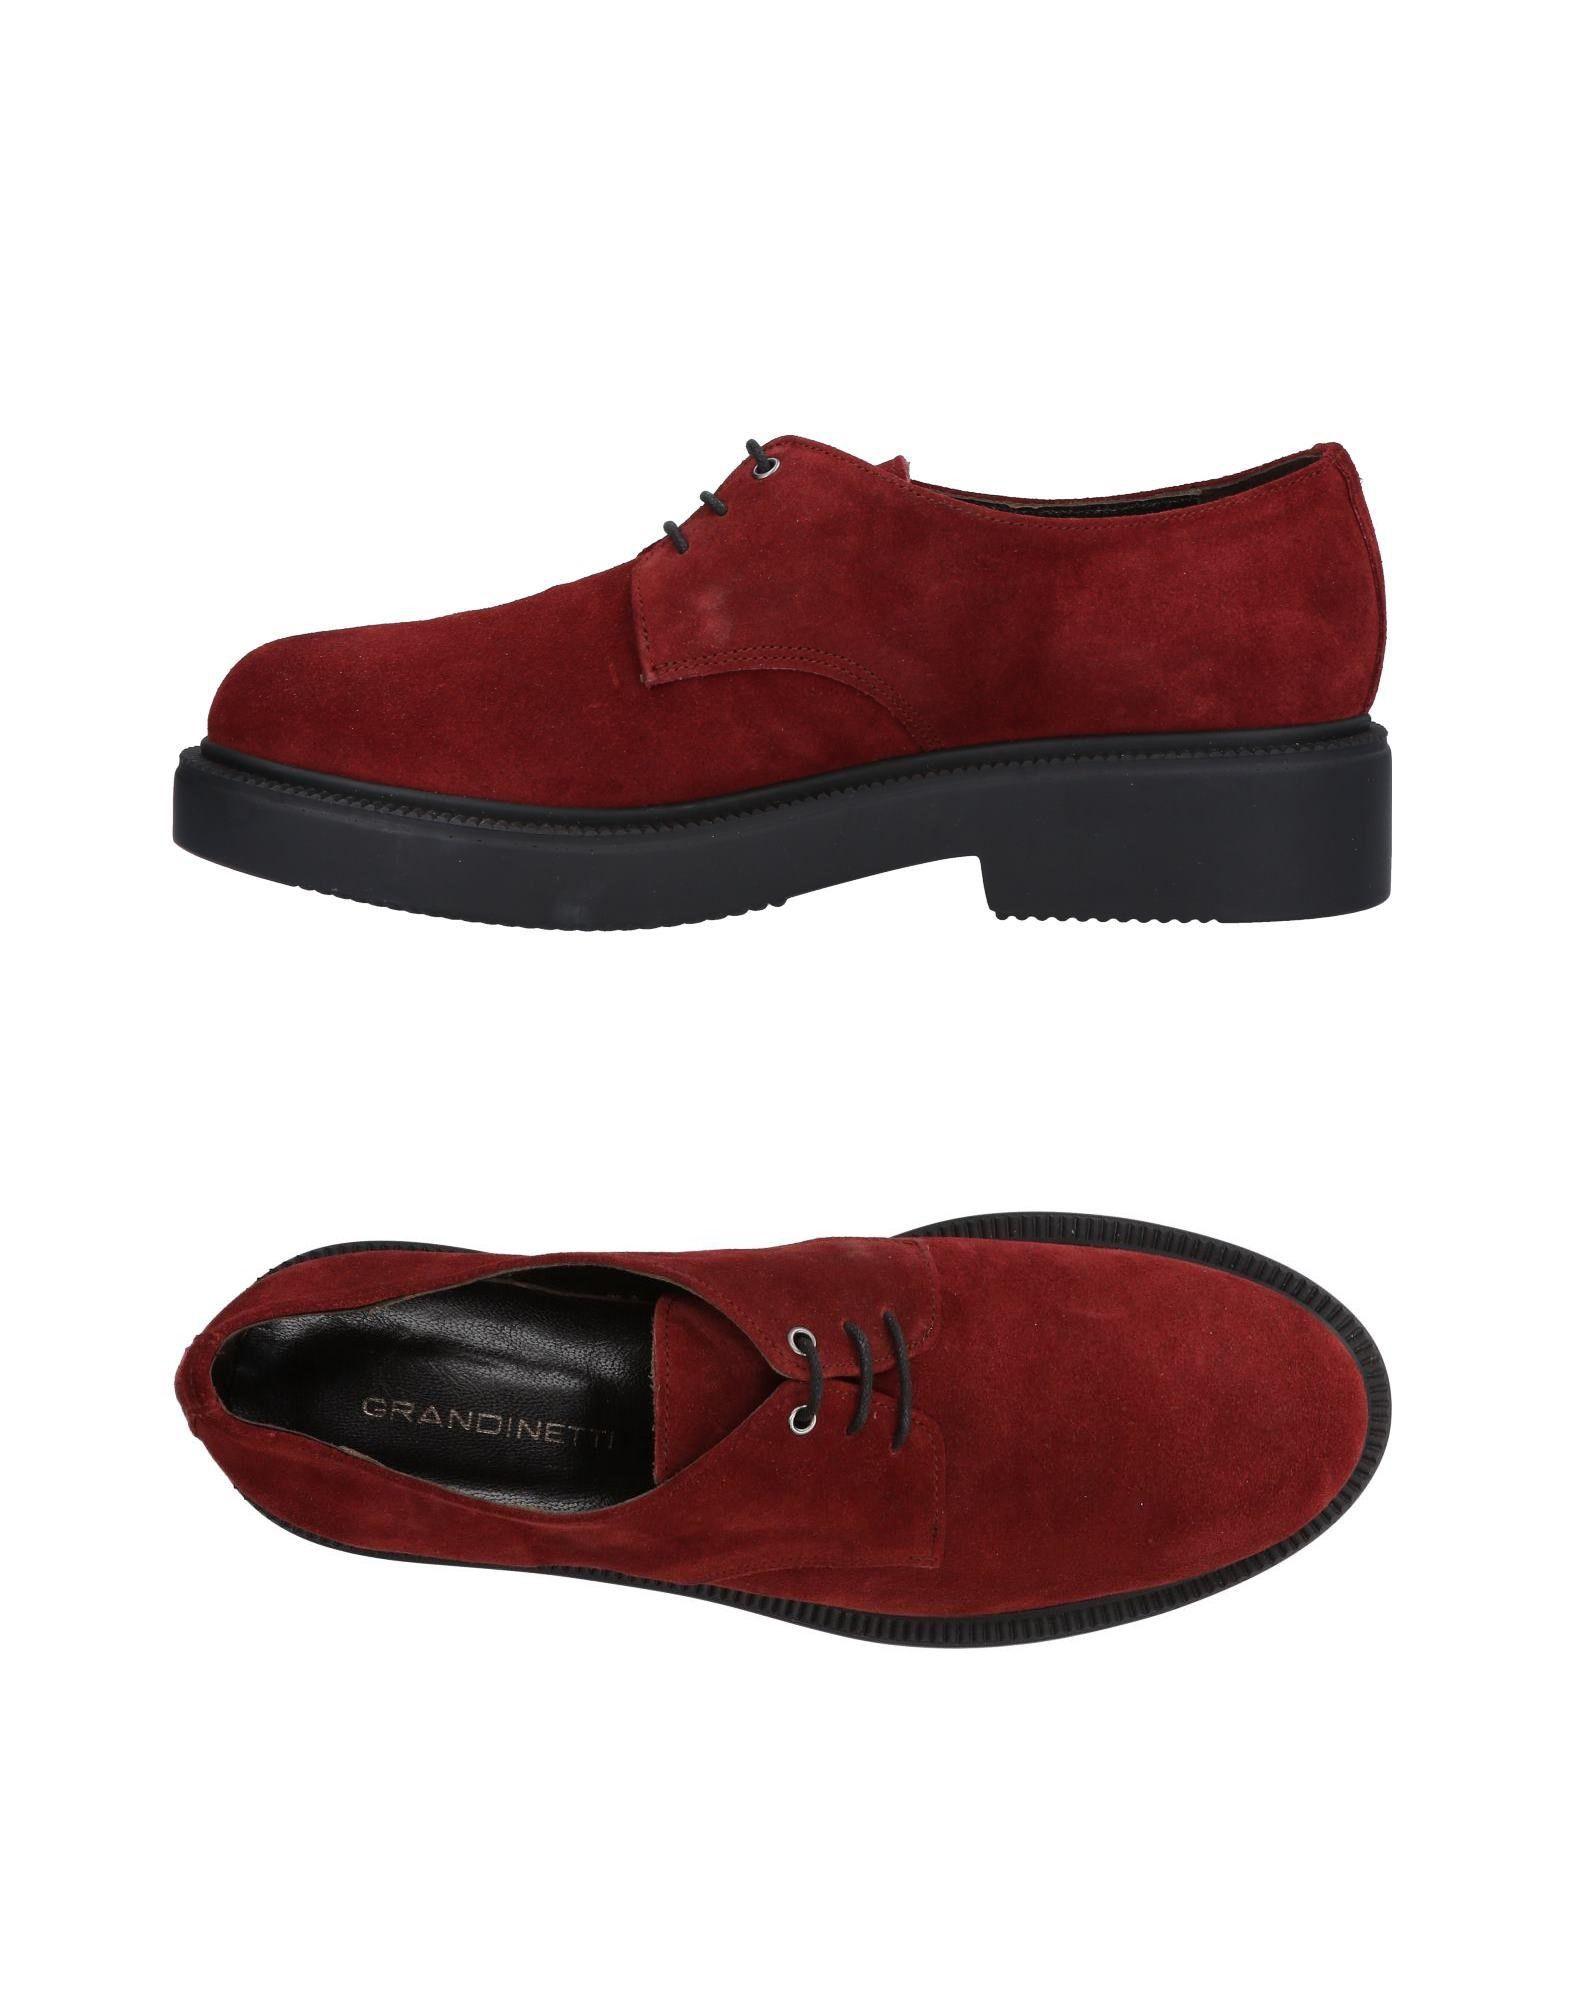 Grandinetti Schnürschuhe Damen  11465358LS Gute Qualität beliebte Schuhe